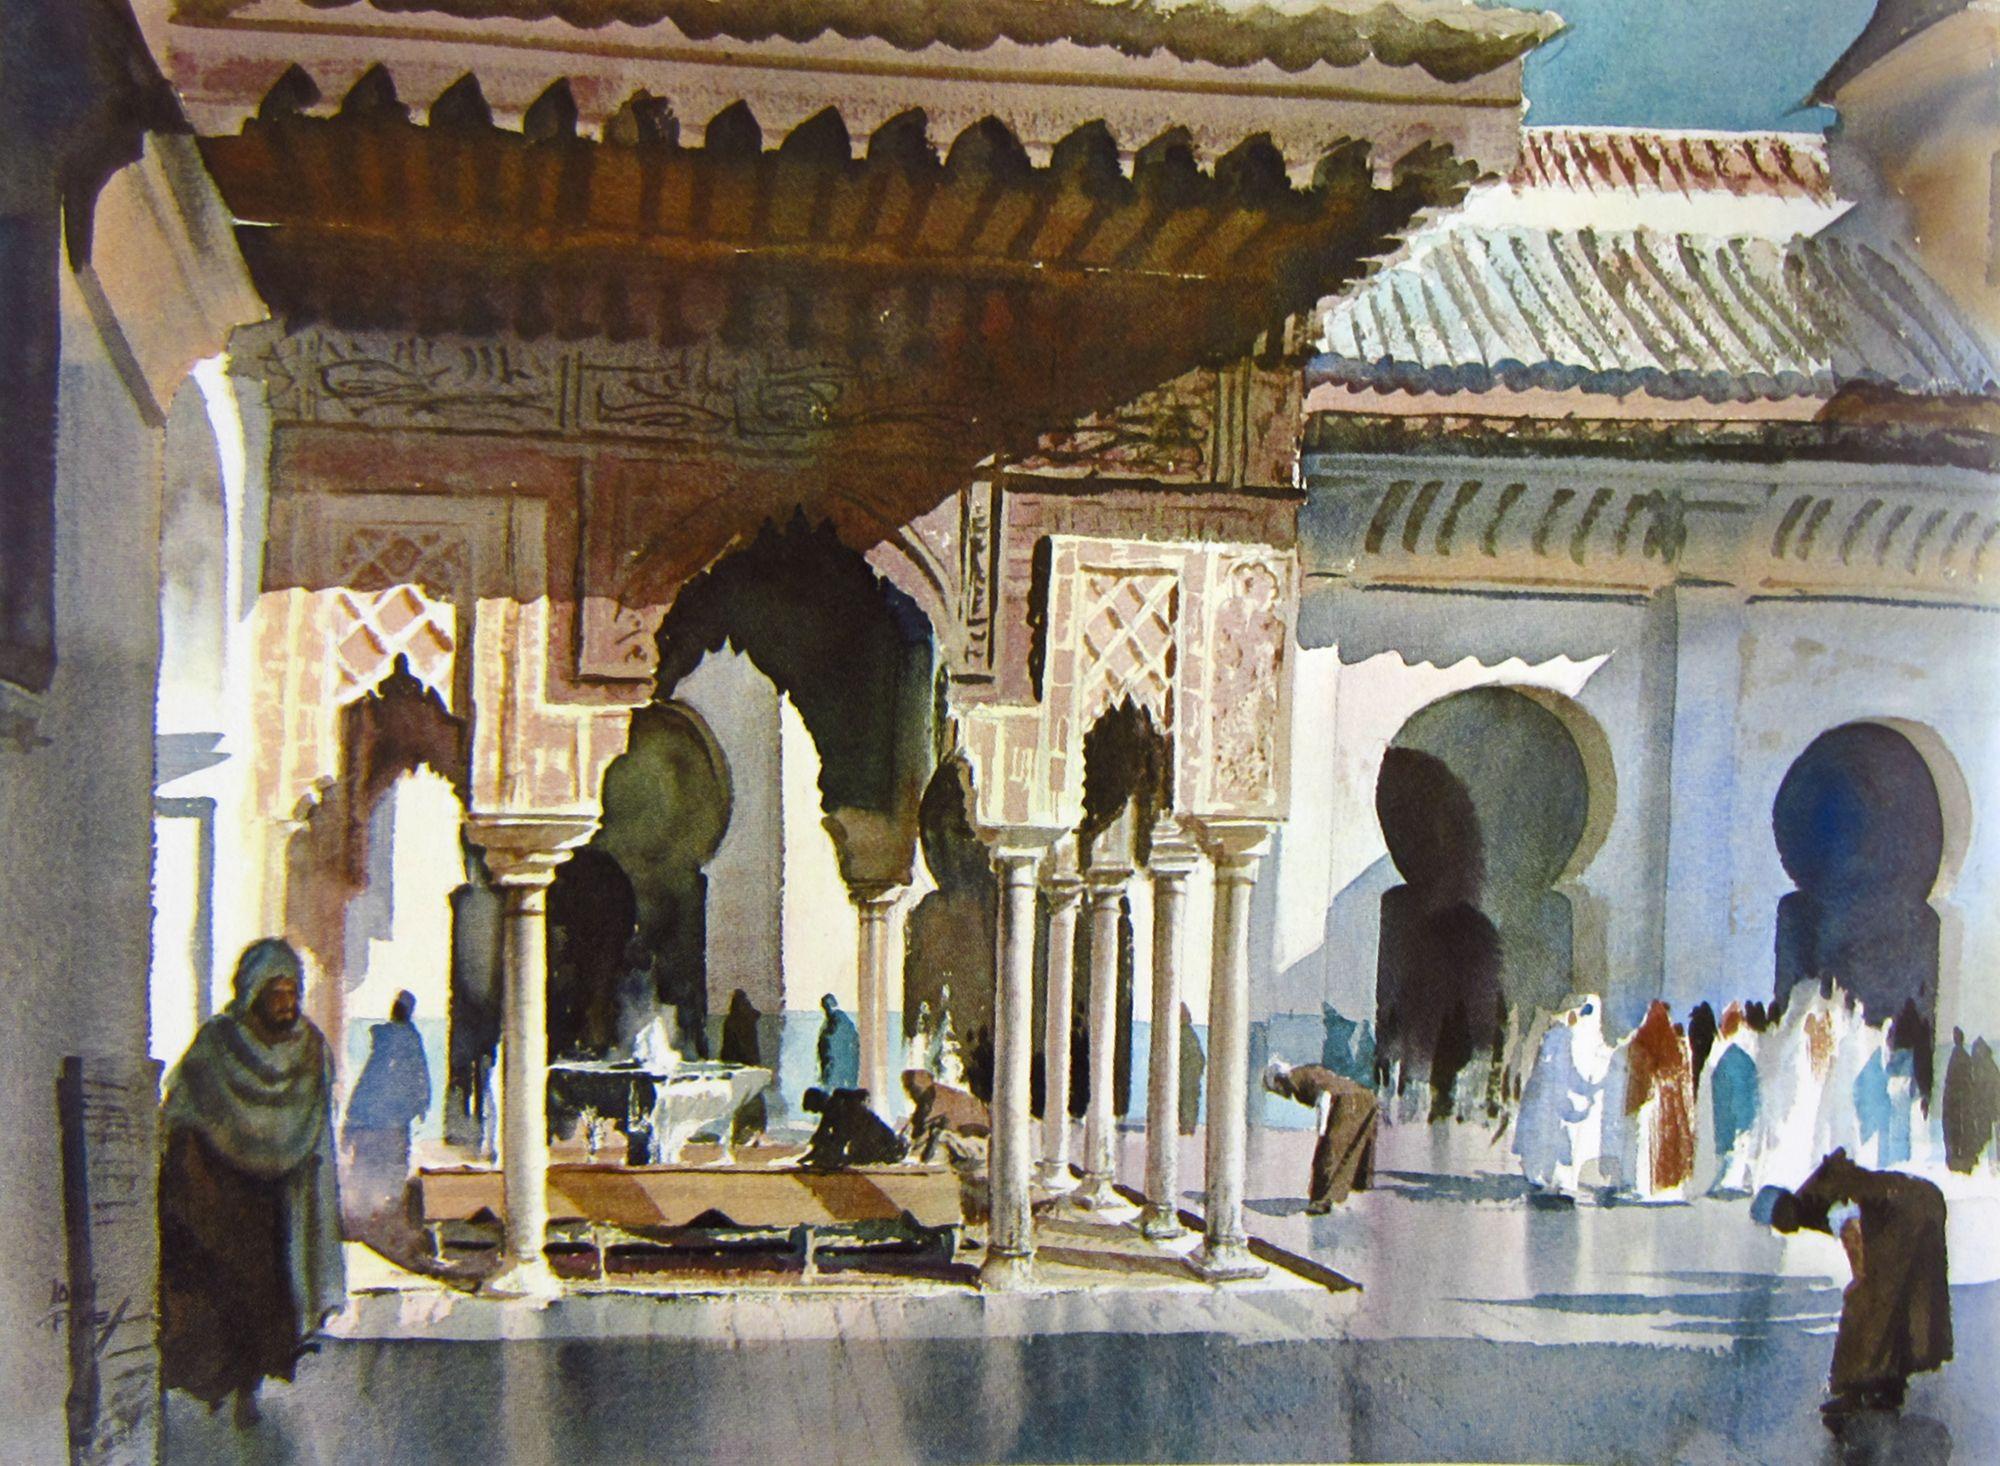 History of watercolor art - John Pike Watercolor Batik Artwatercolor Artcityscapesart History